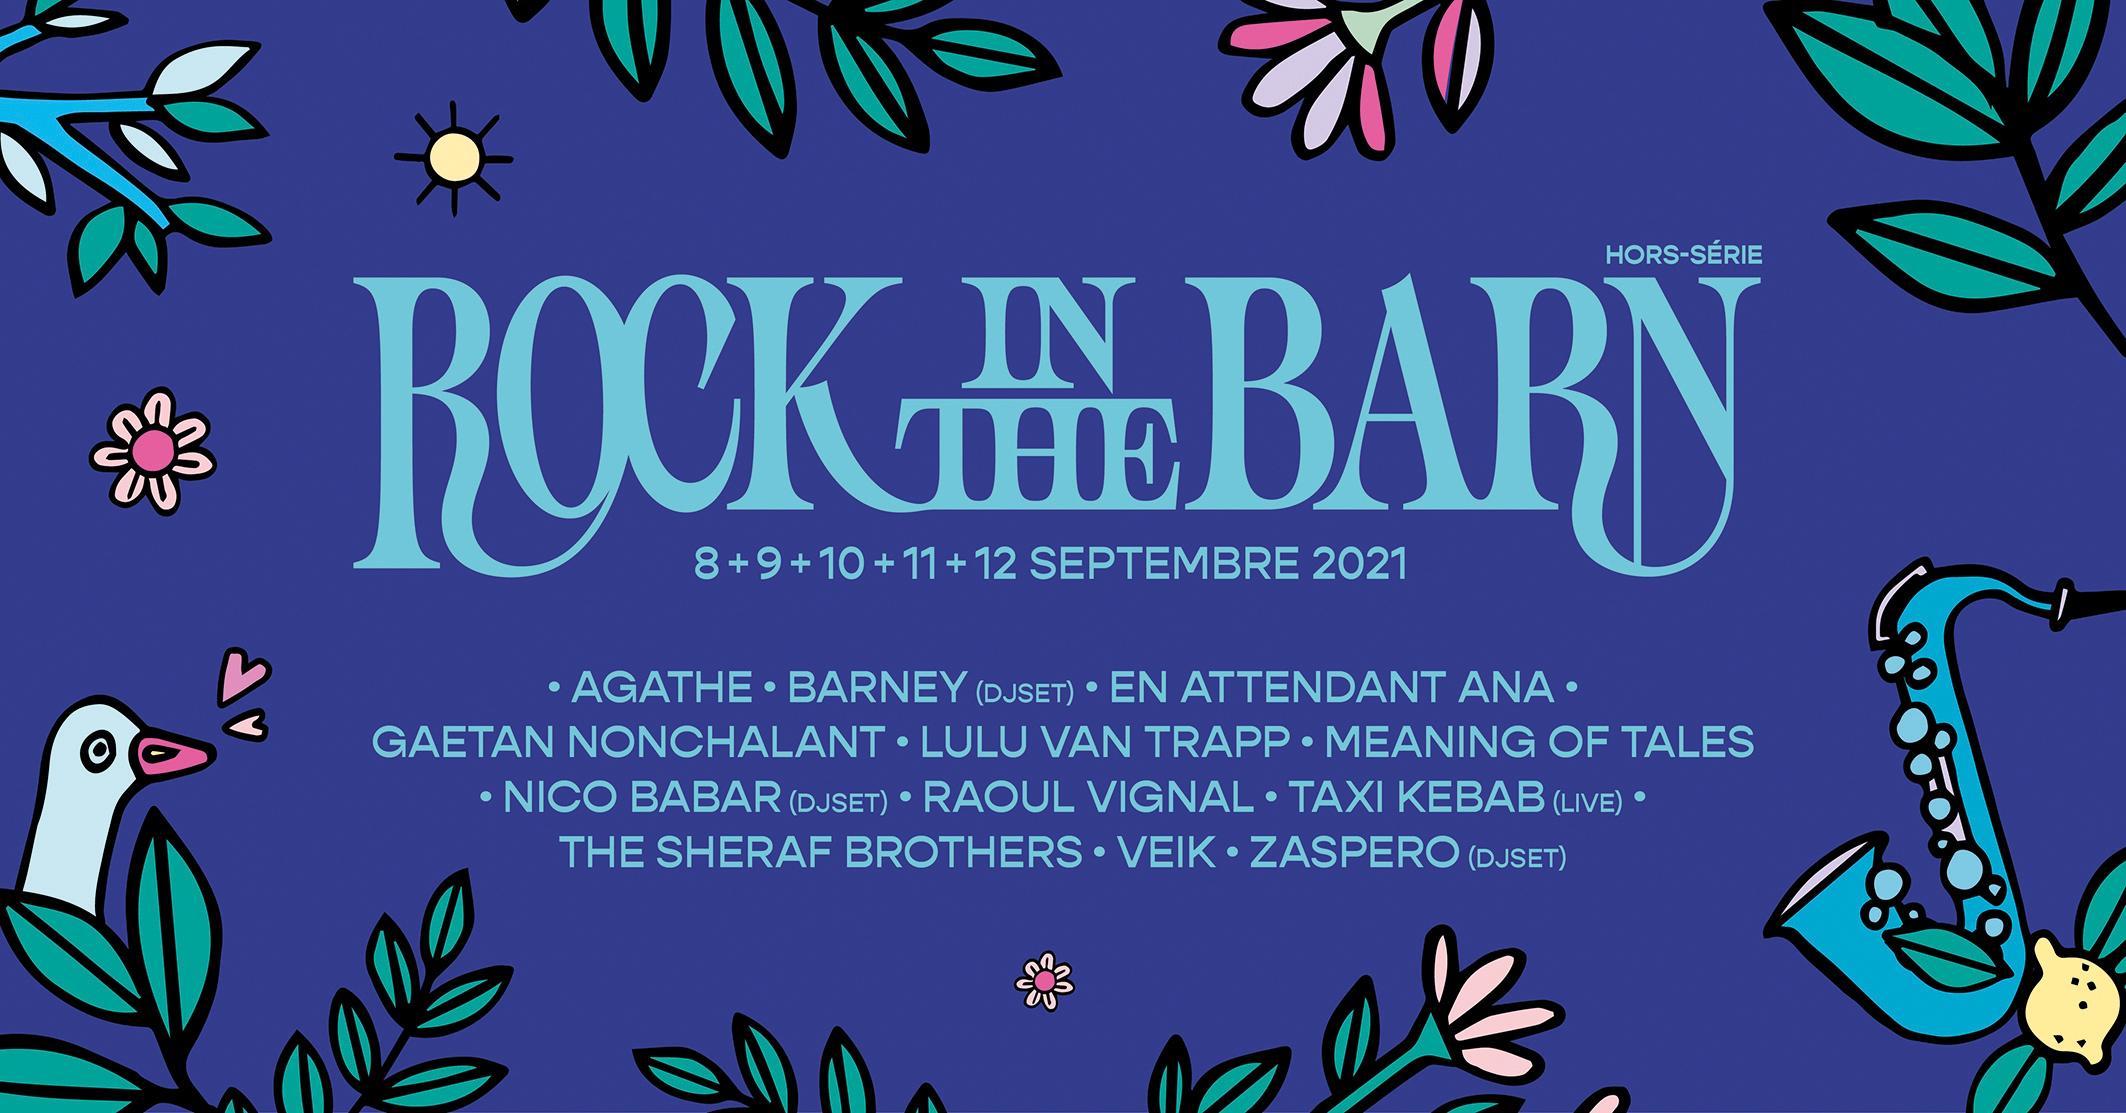 Culture Rock in the Barn 2021 Hors-Série Festival Musique